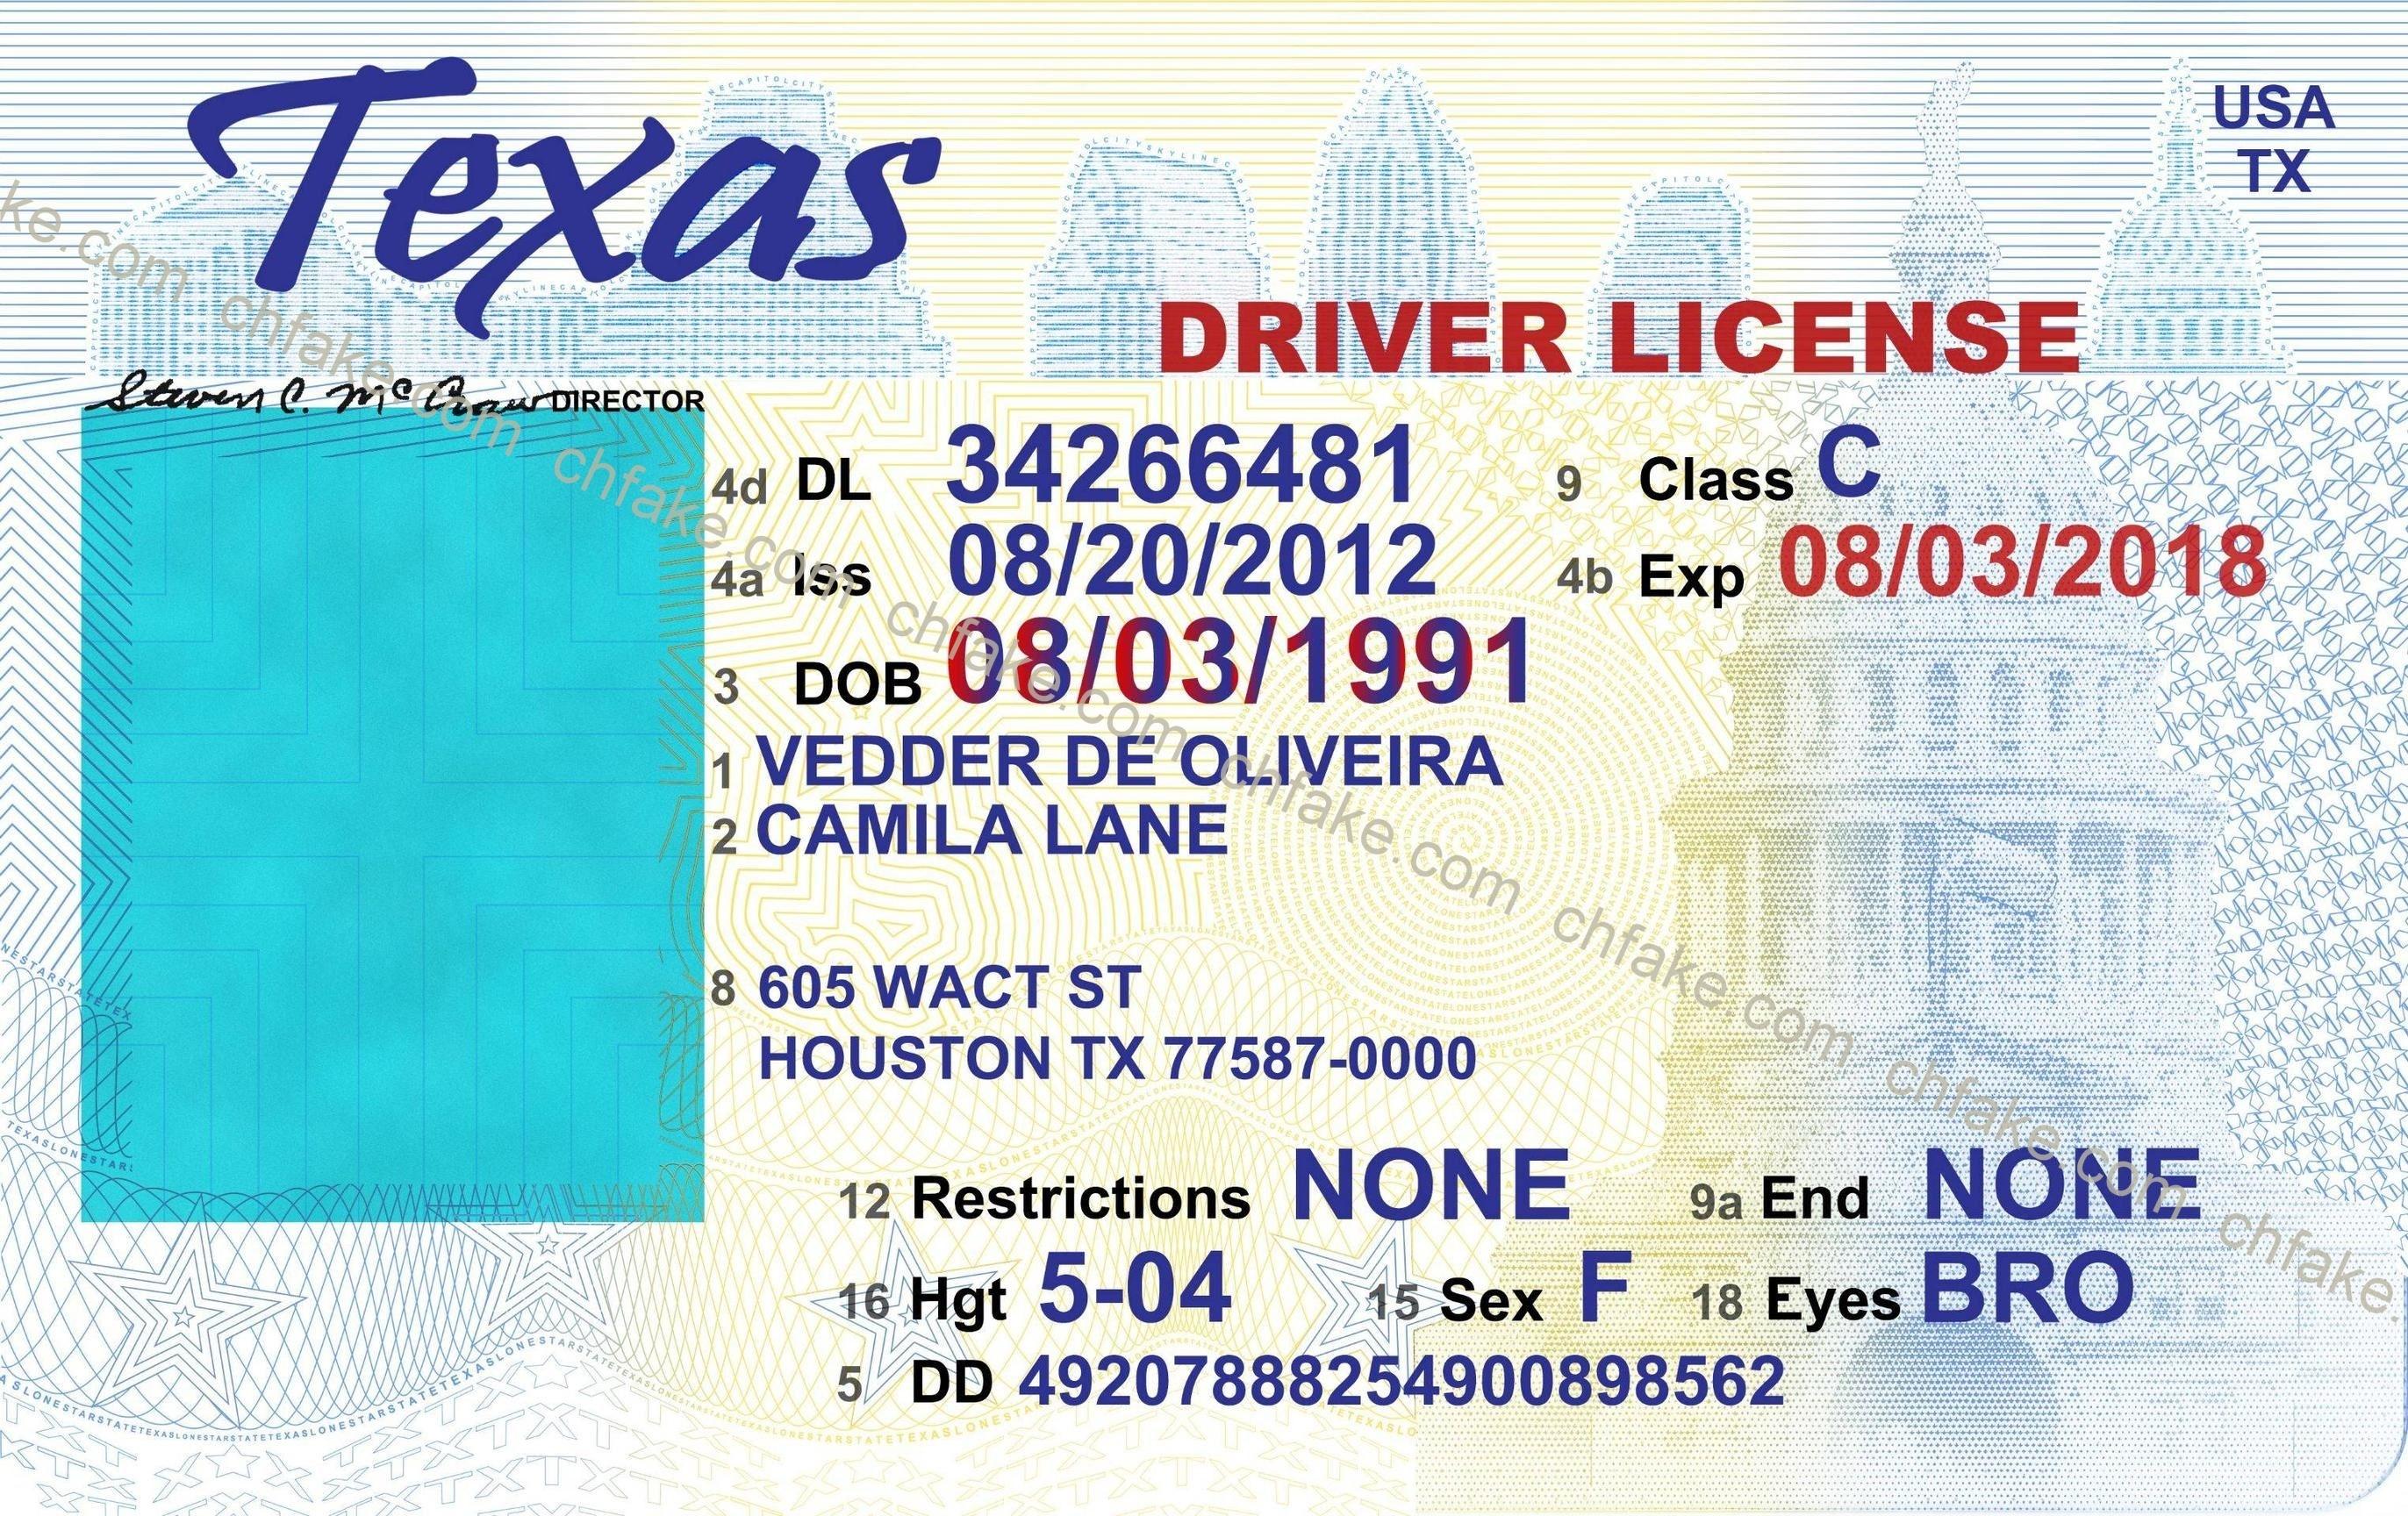 Fake Beepmunk Free Drivers Template Printable License Texas Download - Free Printable Fake Drivers License